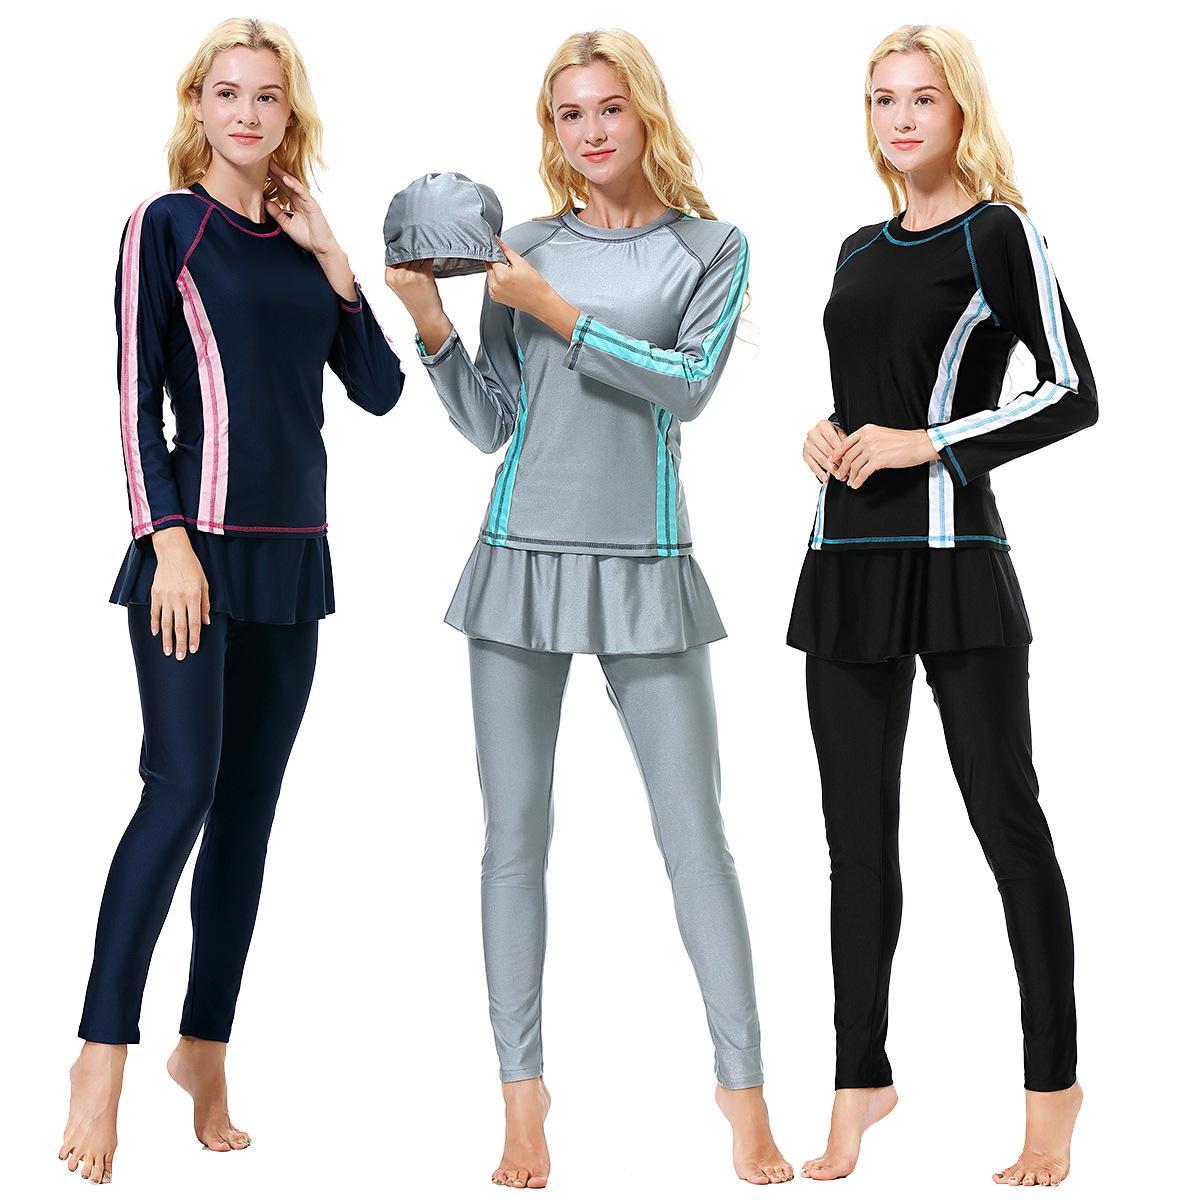 9cb90344553 2019 H1010 Burkini Islamic Swimwear Women Muslim Modest Swim Suit Fashion  Abaya Set Full Covered Short Sleeve Plus Size From Dujotree, $23.53 |  DHgate.Com